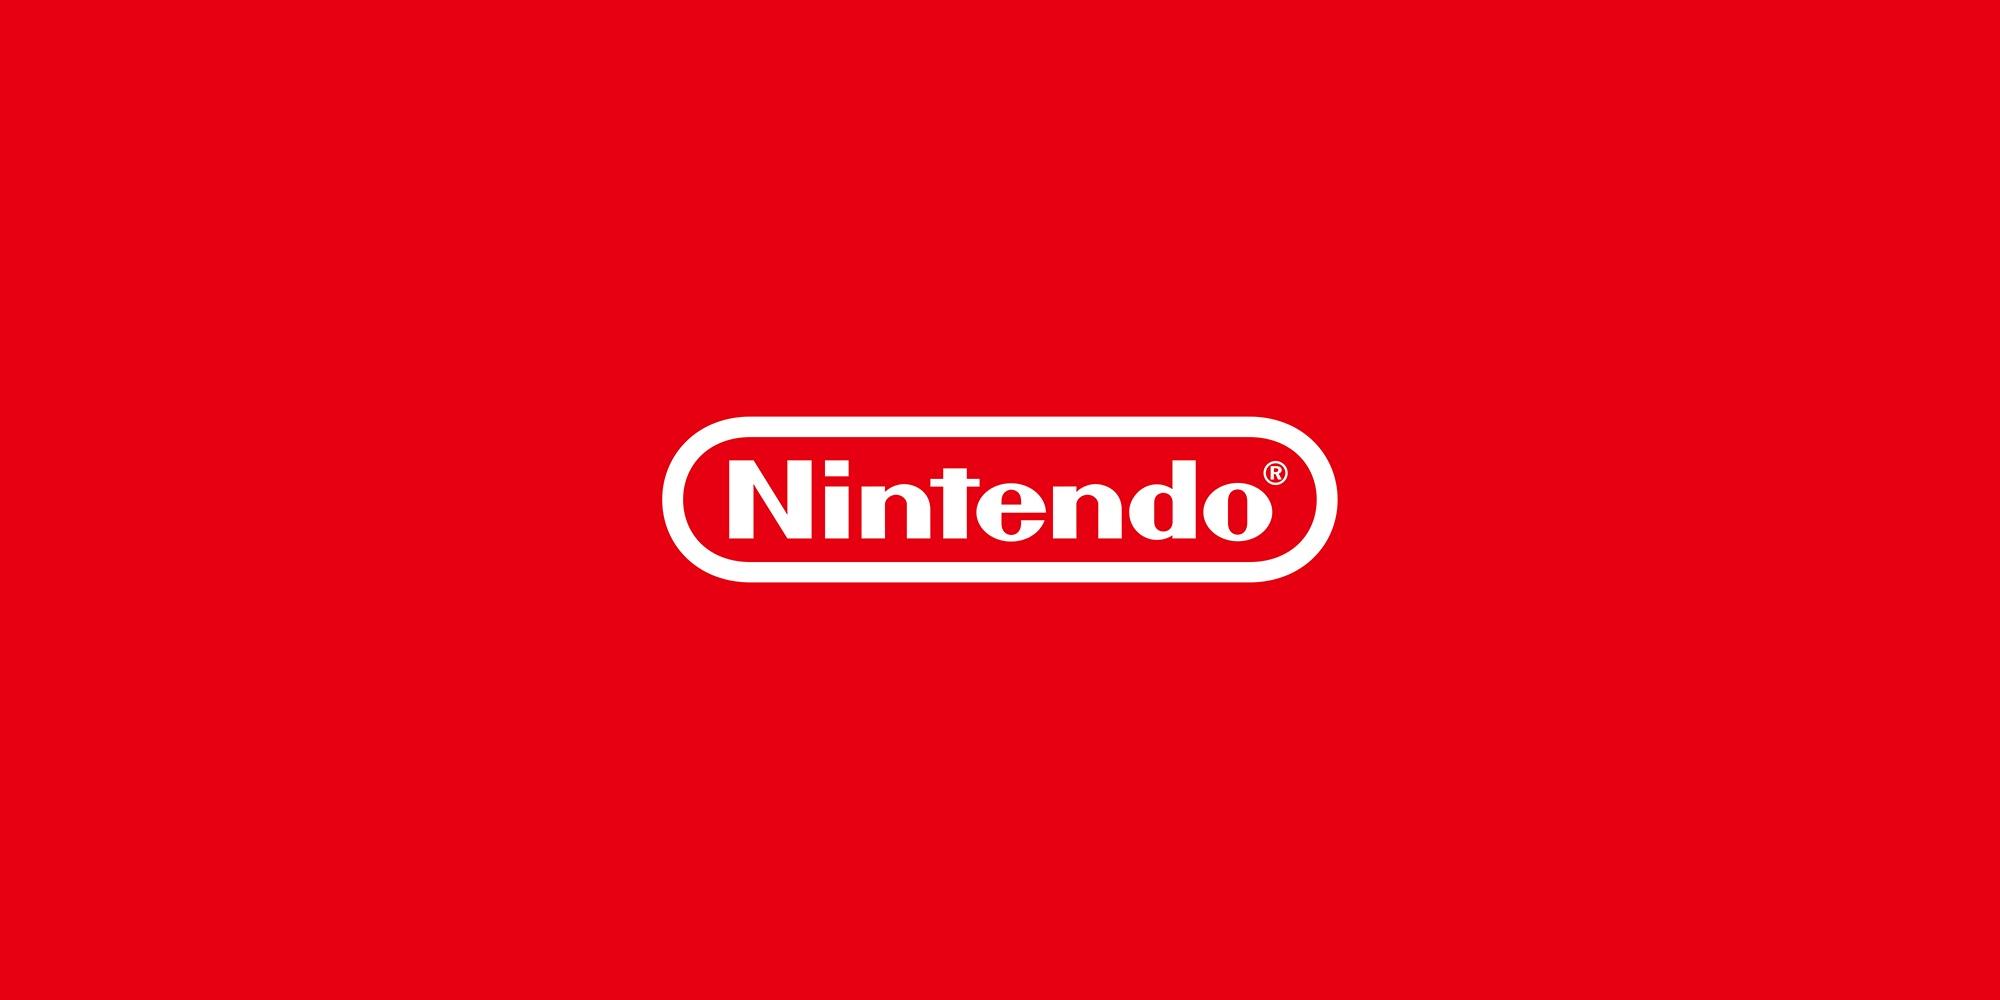 E3 Calendario.El Nintendo Direct Del E3 2019 Apunta A Una Duracion De 40